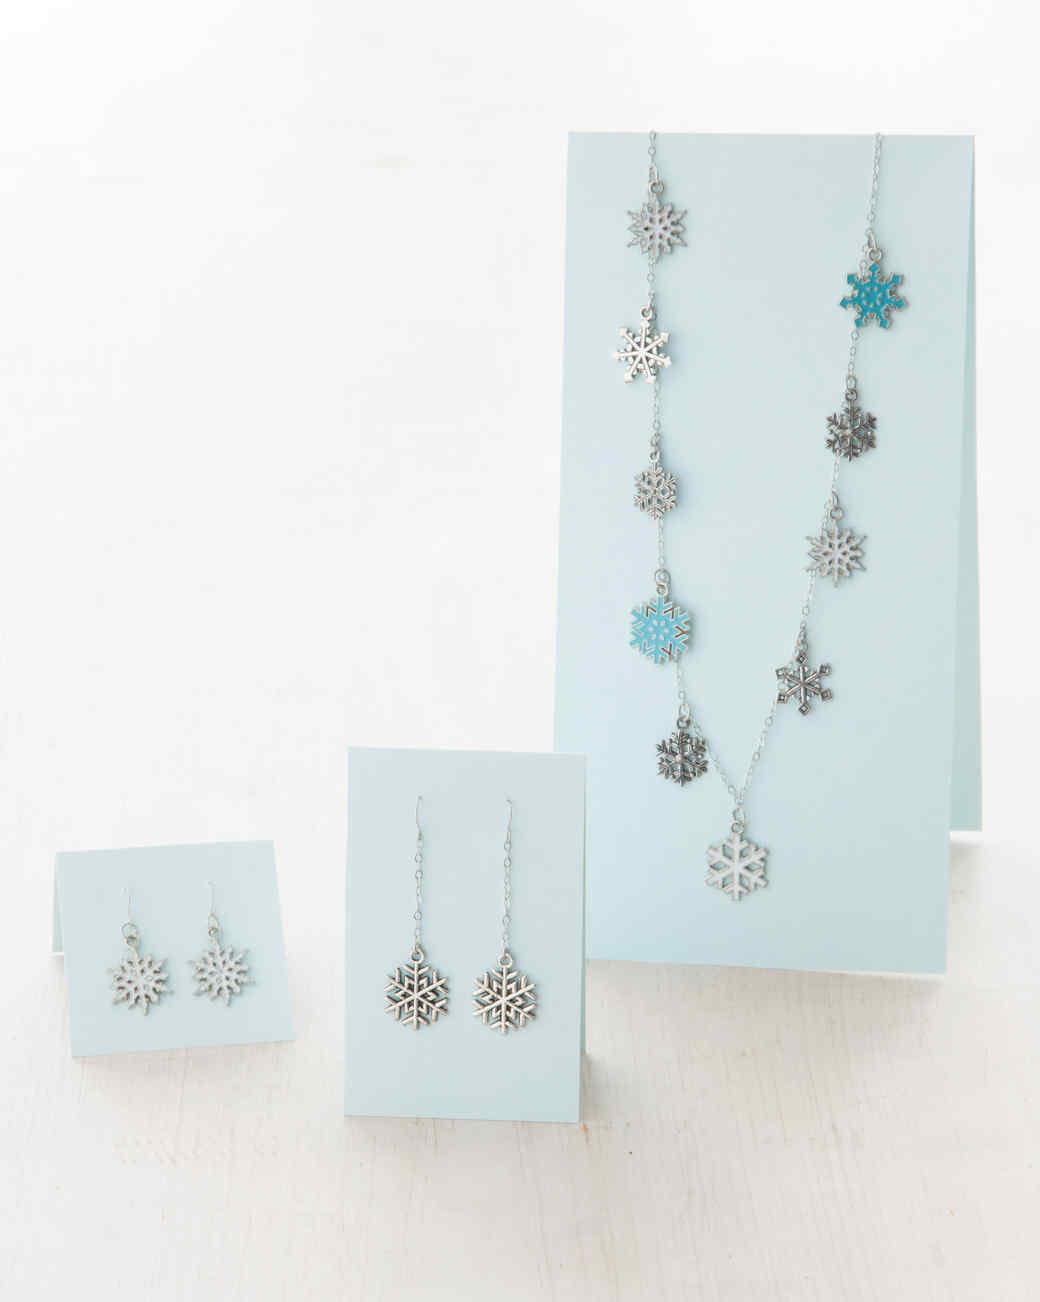 snowflake-jewelry-0442-d11.jpg